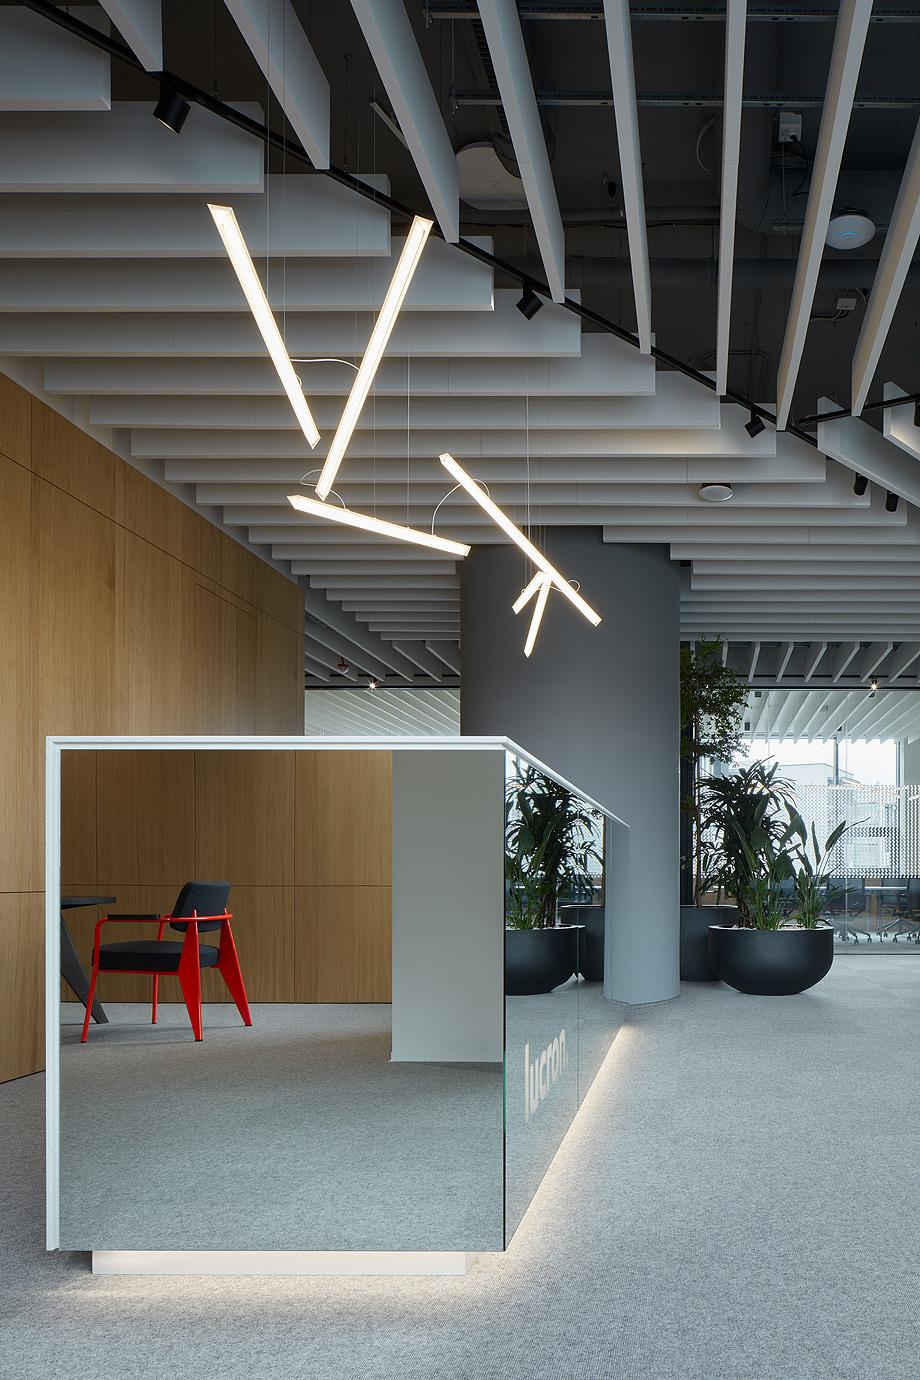 oficinas lucron de cechvala architects - foto boysplaynice (2)